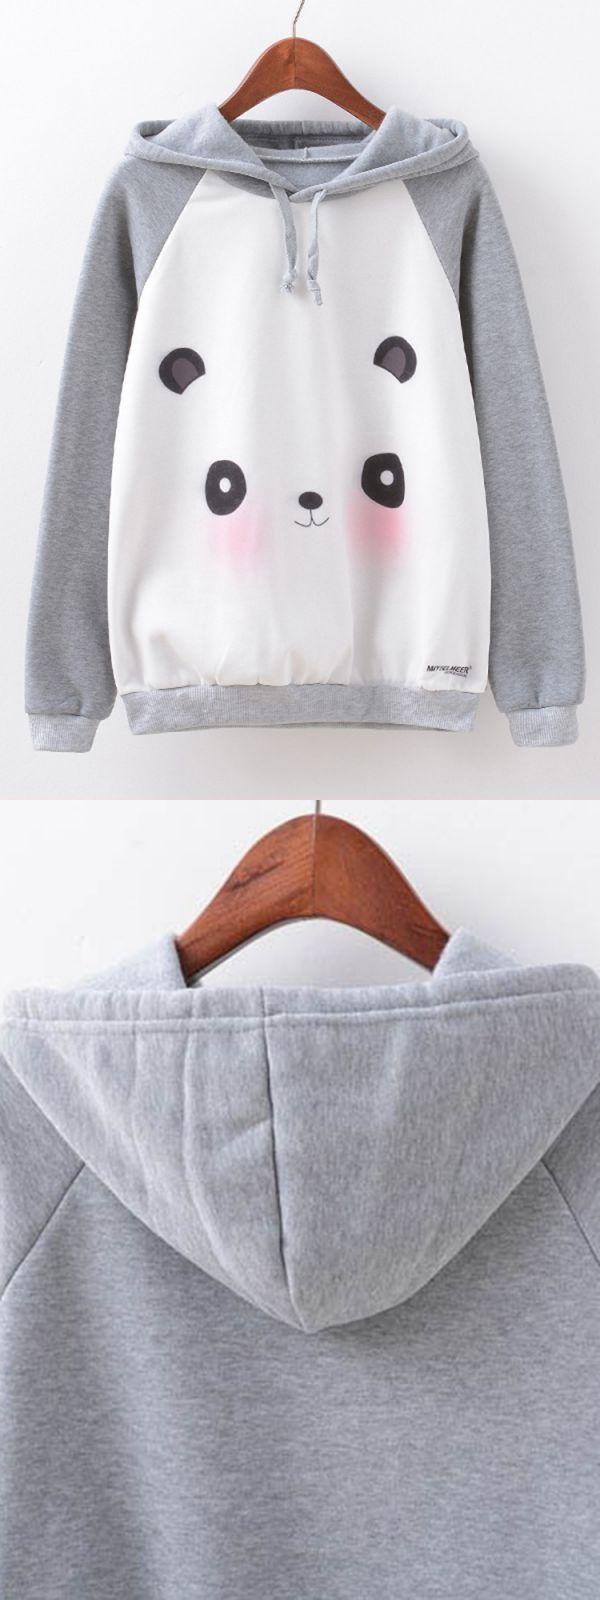 Sweatshirts 80s cute women cartoon panda printed long sleeve hoodies #80s #sweatshirts #for #sale #oconnor #sweatshirts #sweatshirts #express #sweatshirts #tillys